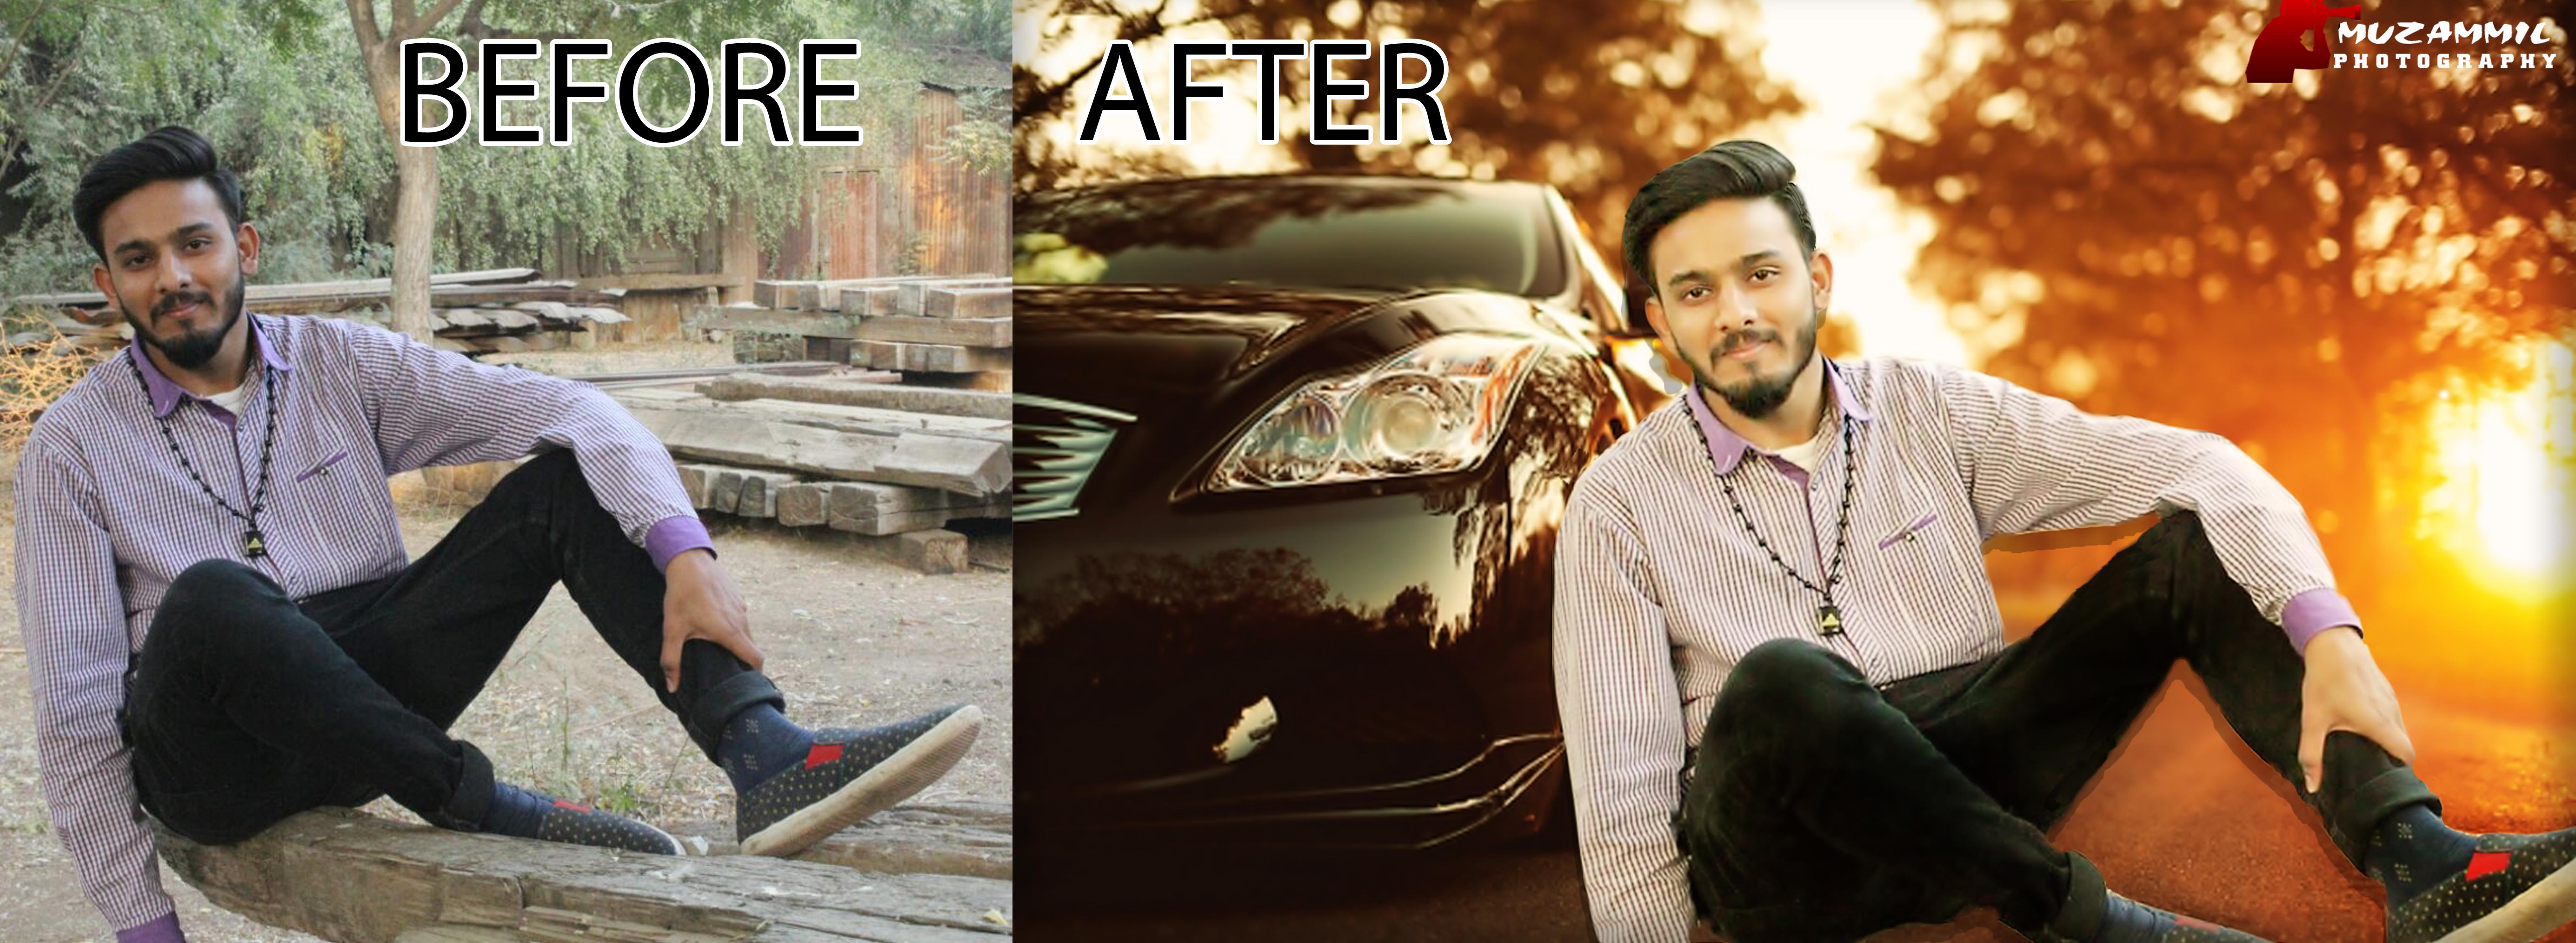 Do Professional Photo Retouching and change background